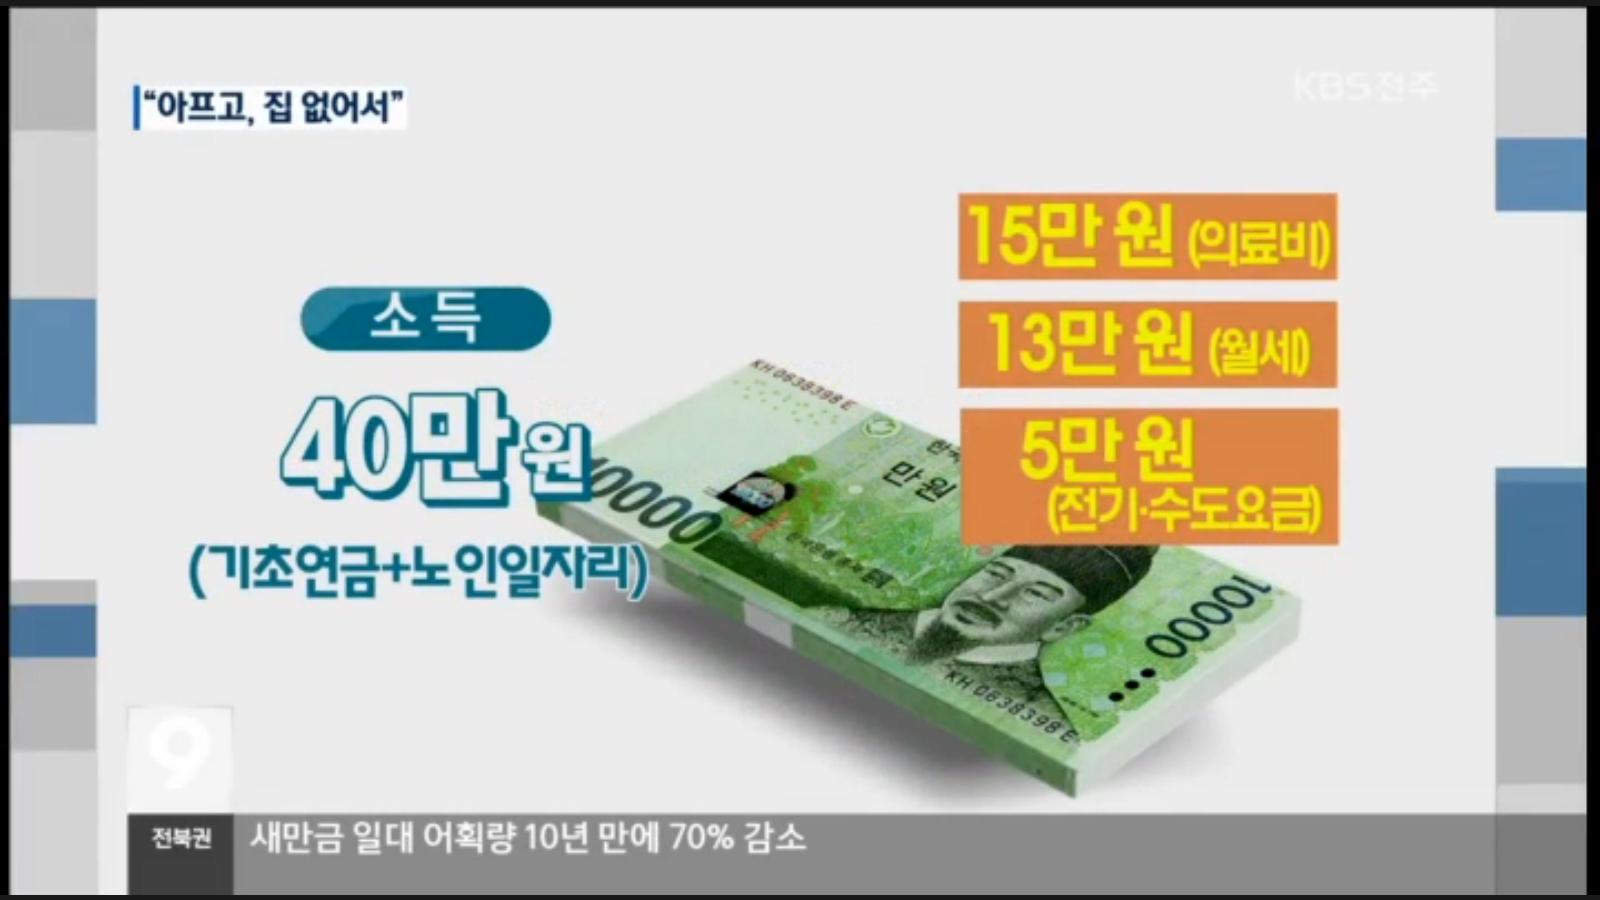 [17.2.16 KBS전주 ] 빈곤노년, 부양의무제가 폐지가 답이다.3.jpg